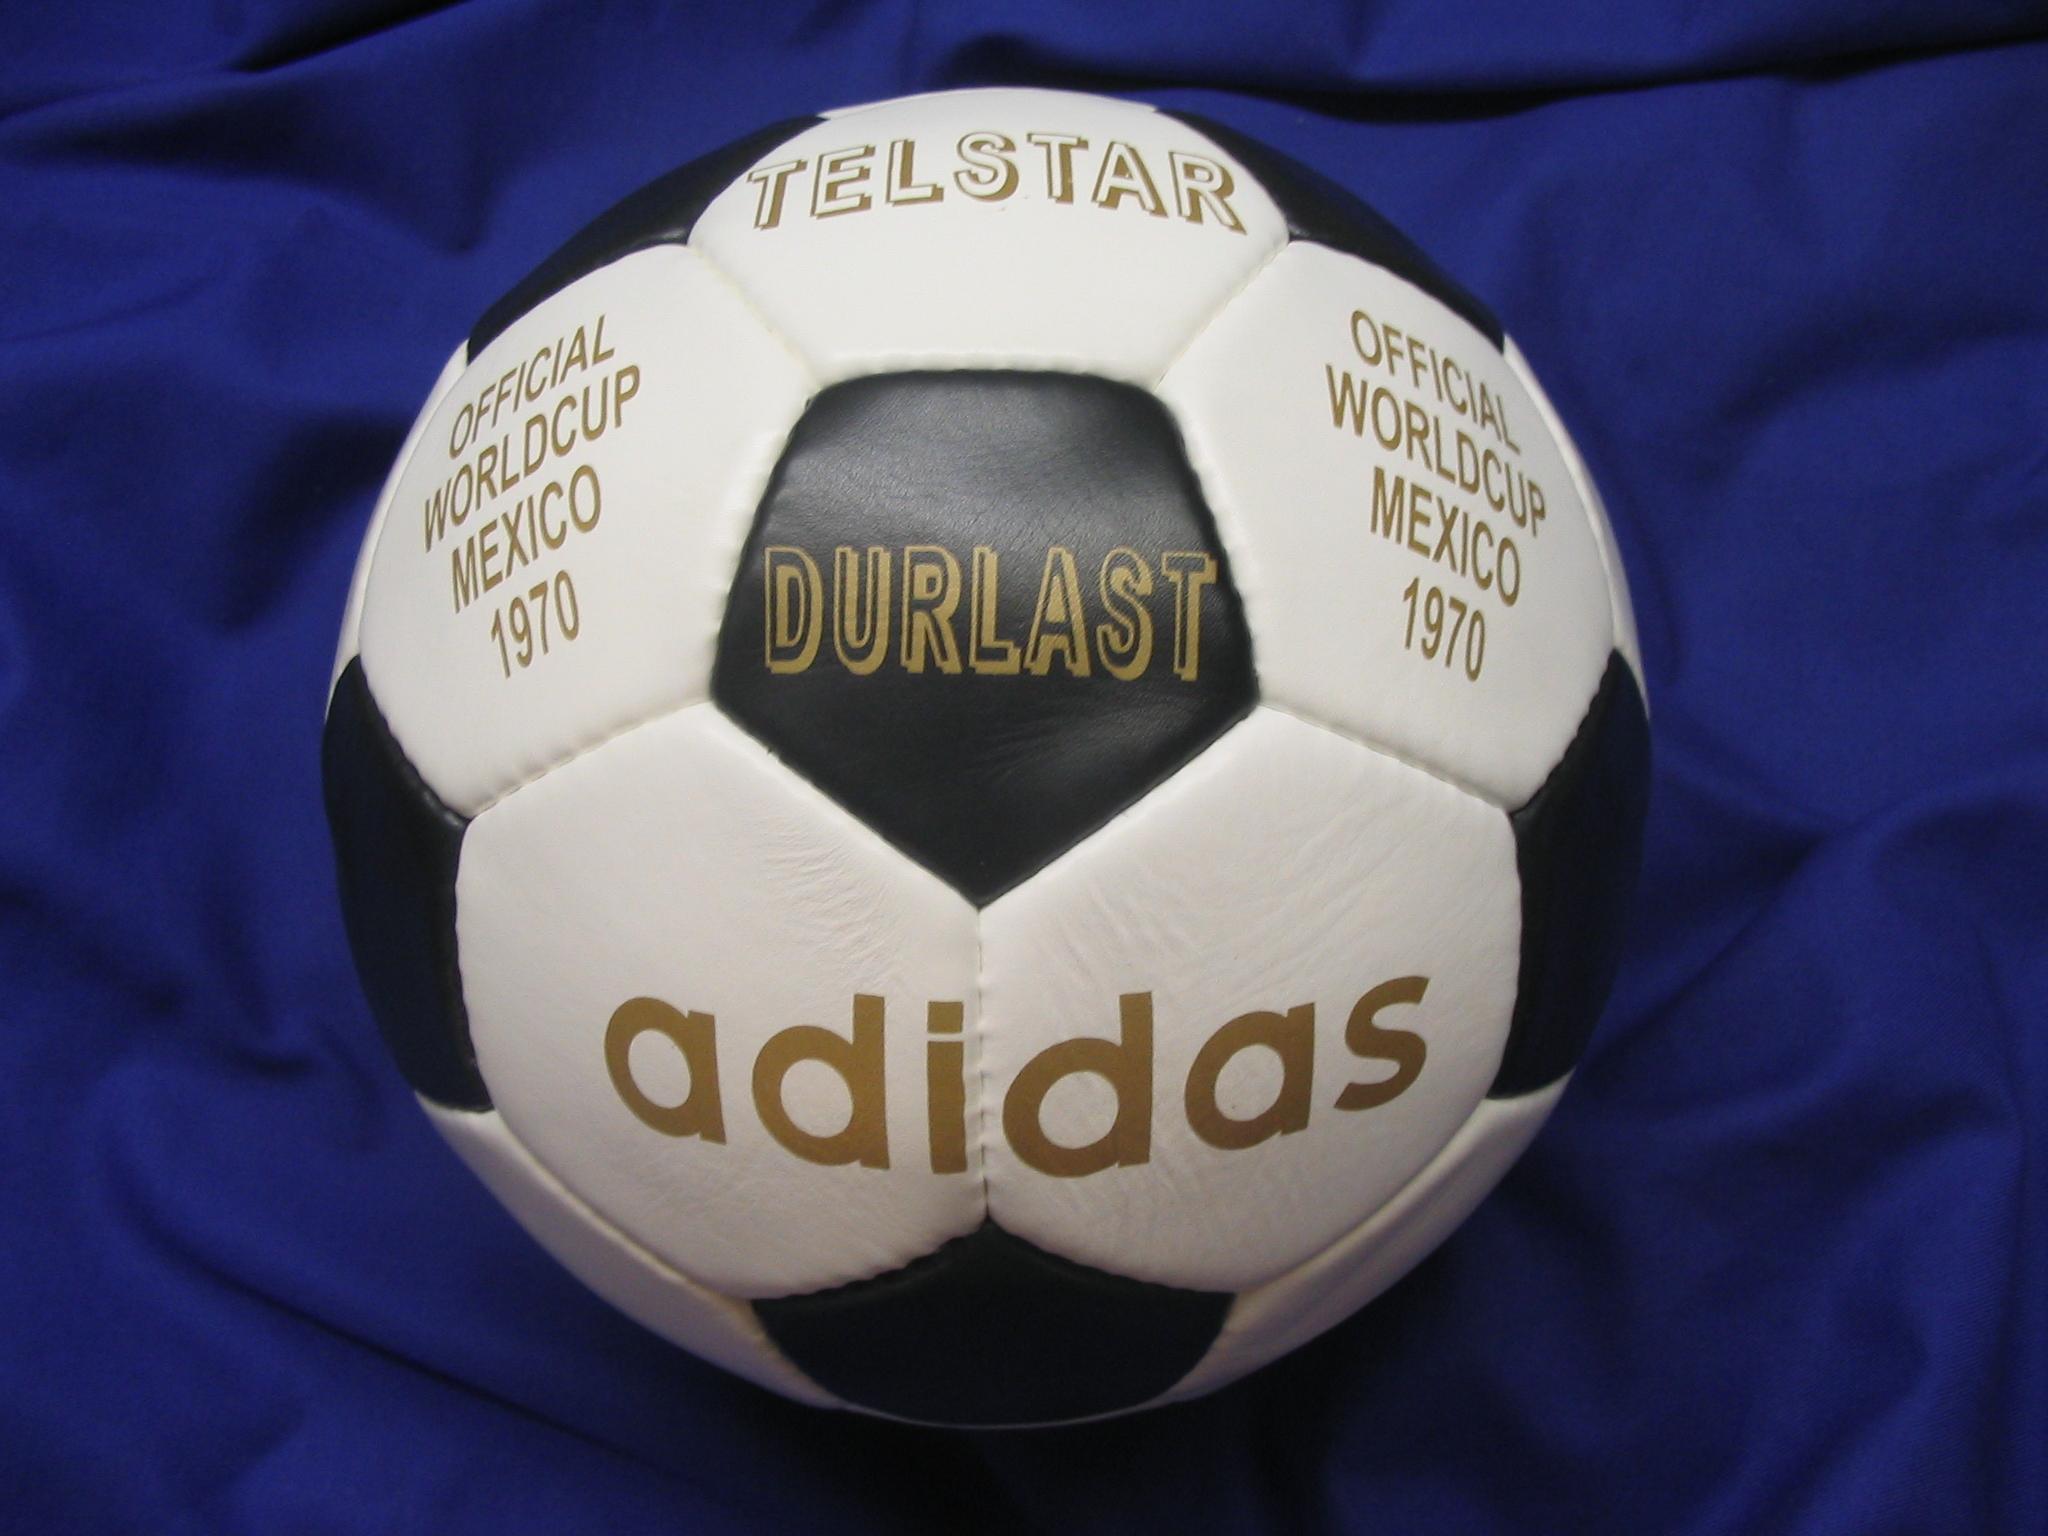 c87506bfc واحتفظت الكرة الحديثة بنفس الألوان والتصميم تقريباً، مما سيجعلها أكثر  وضوحاً على شاشة التلفاز الحديثة أيضاً، كما تم تزويدها بمعدات تقنية جعلتها  أول كرة ذكية ...